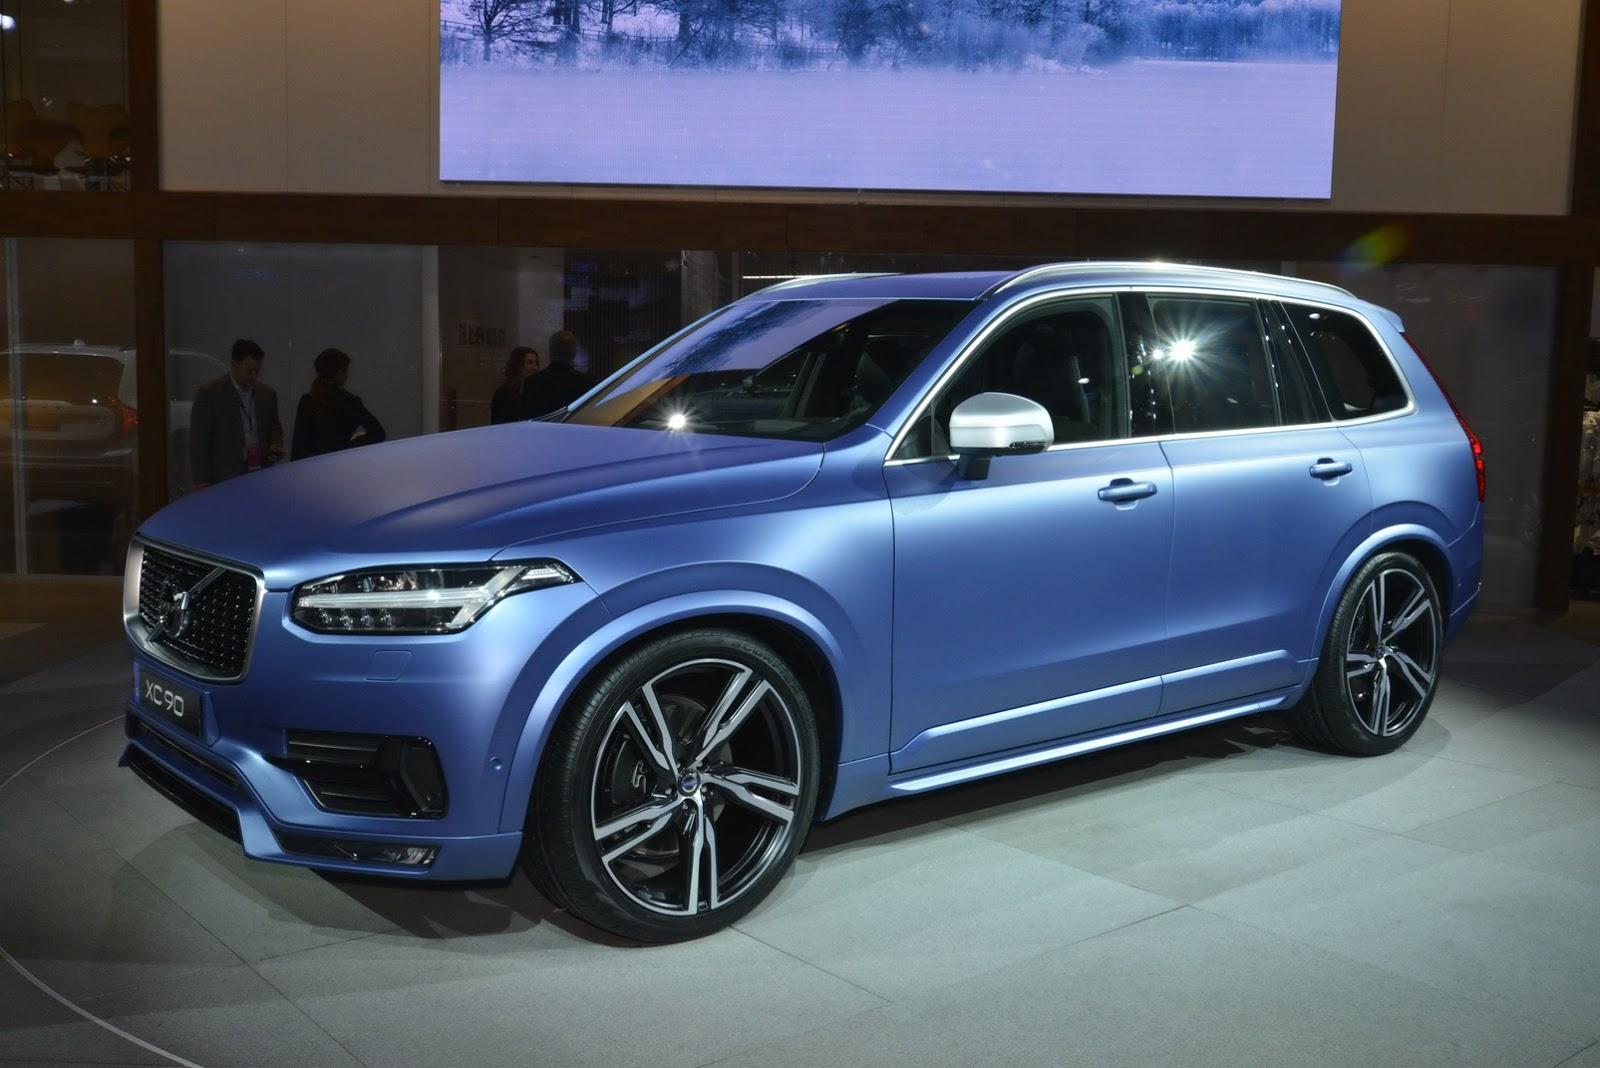 2016 Volvo Xc90 R-Design New